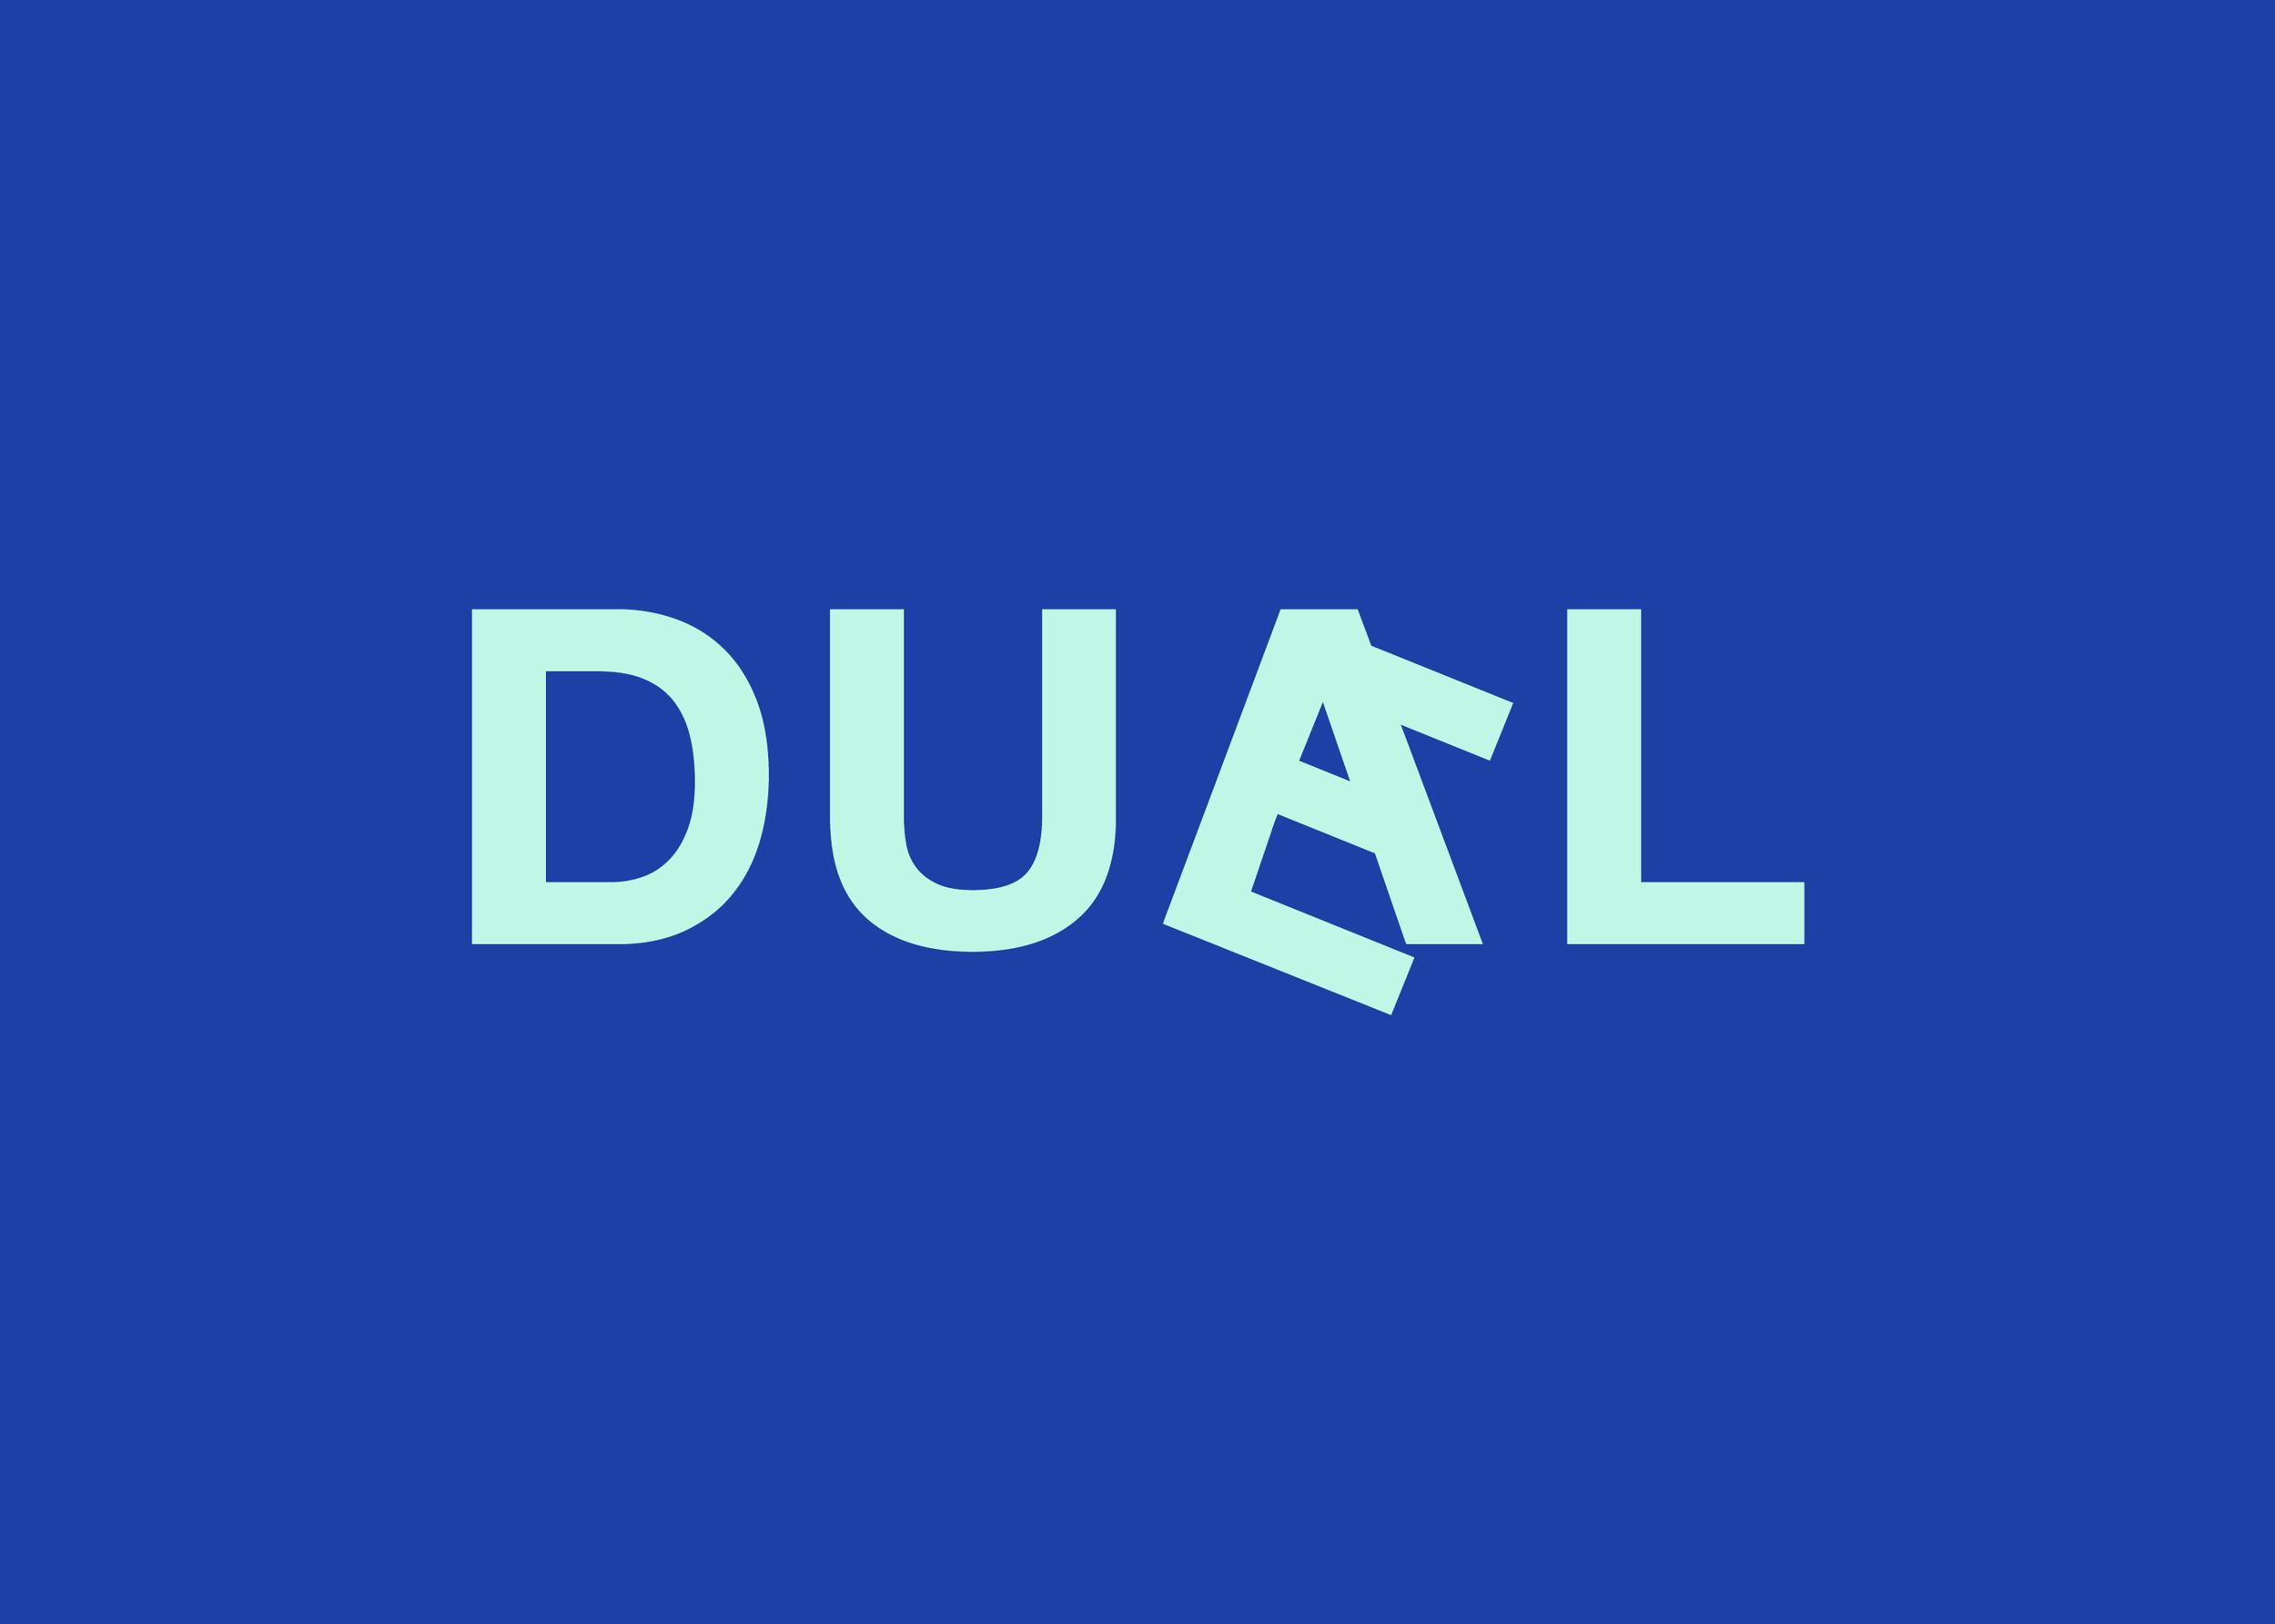 duael_flip7.png